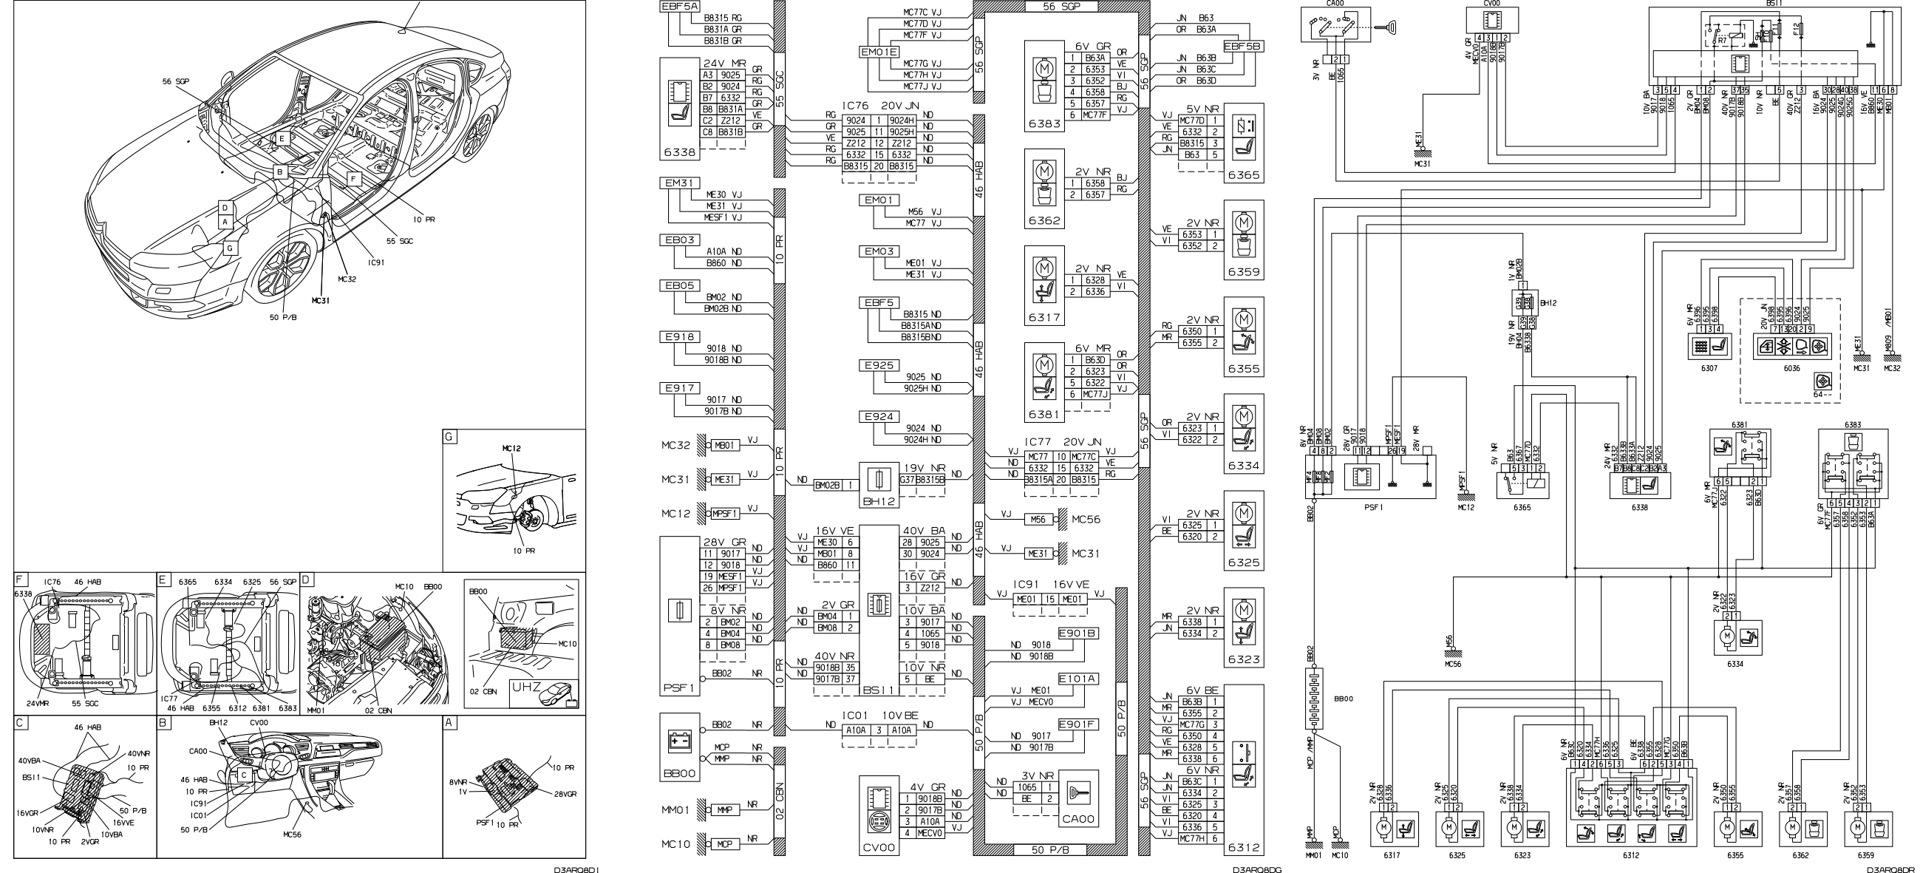 wiring diagram citroen c3 aircross espaol